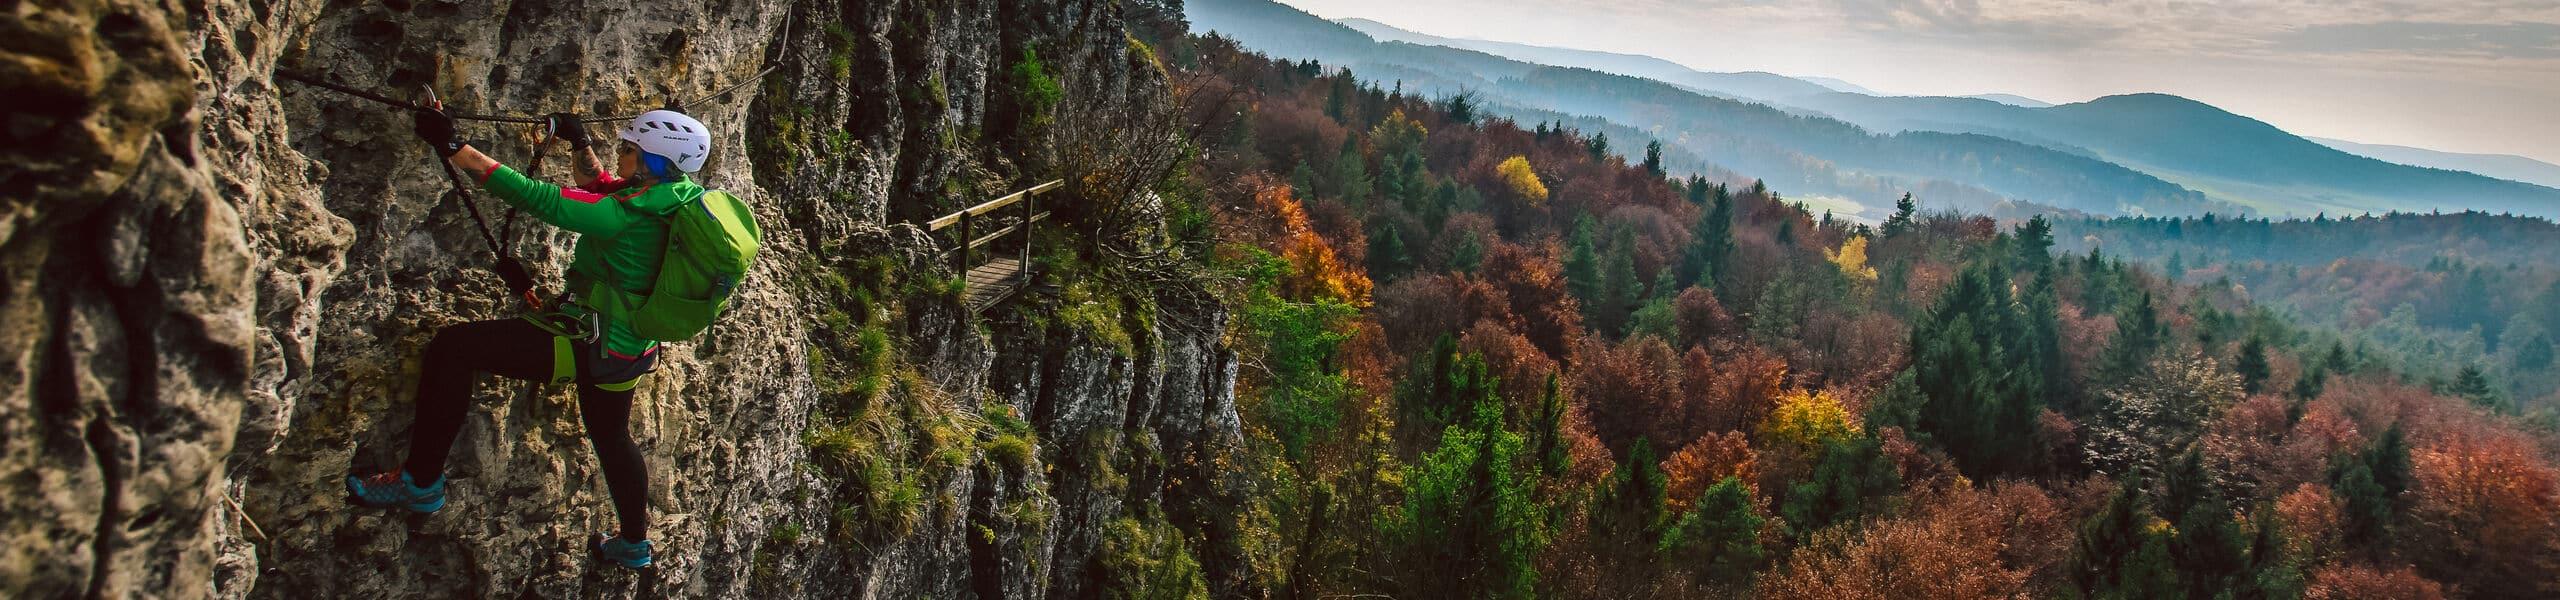 Kletterer am Höhenglücksteig im Landkreis Amberg-Sulzbach